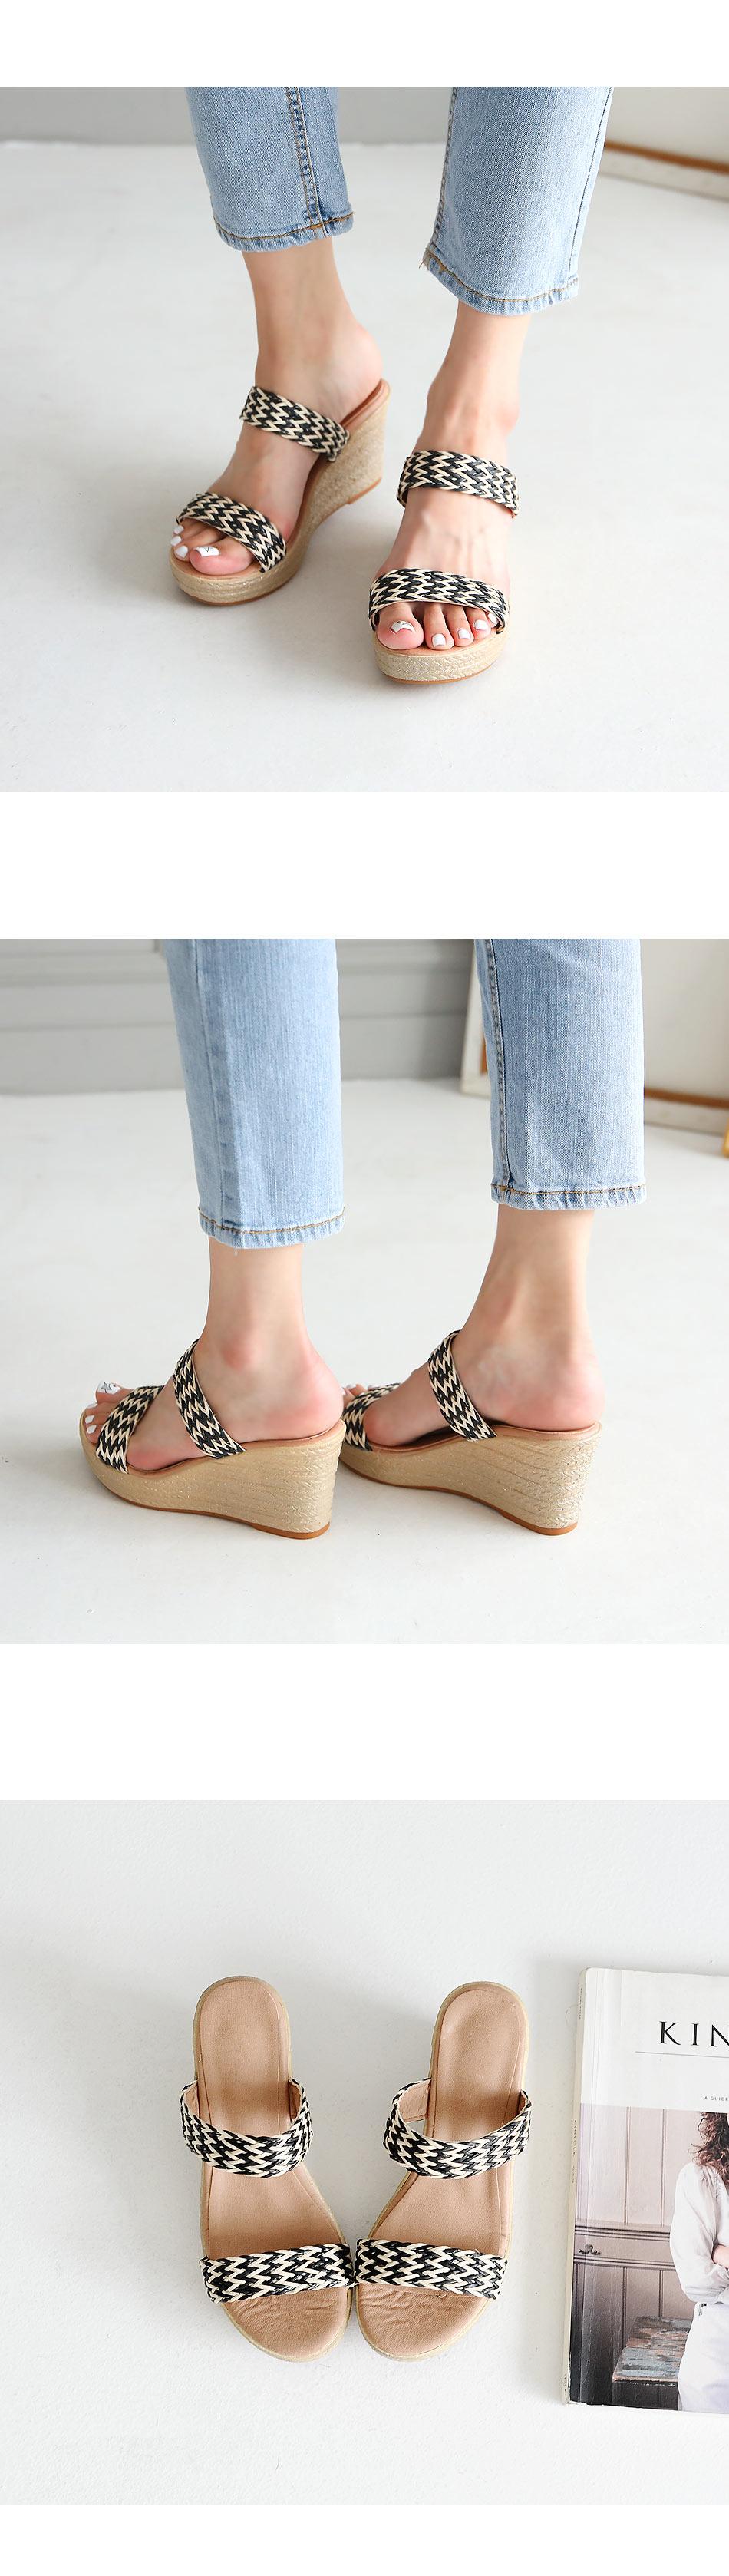 Marne Wedge Slippers 8cm